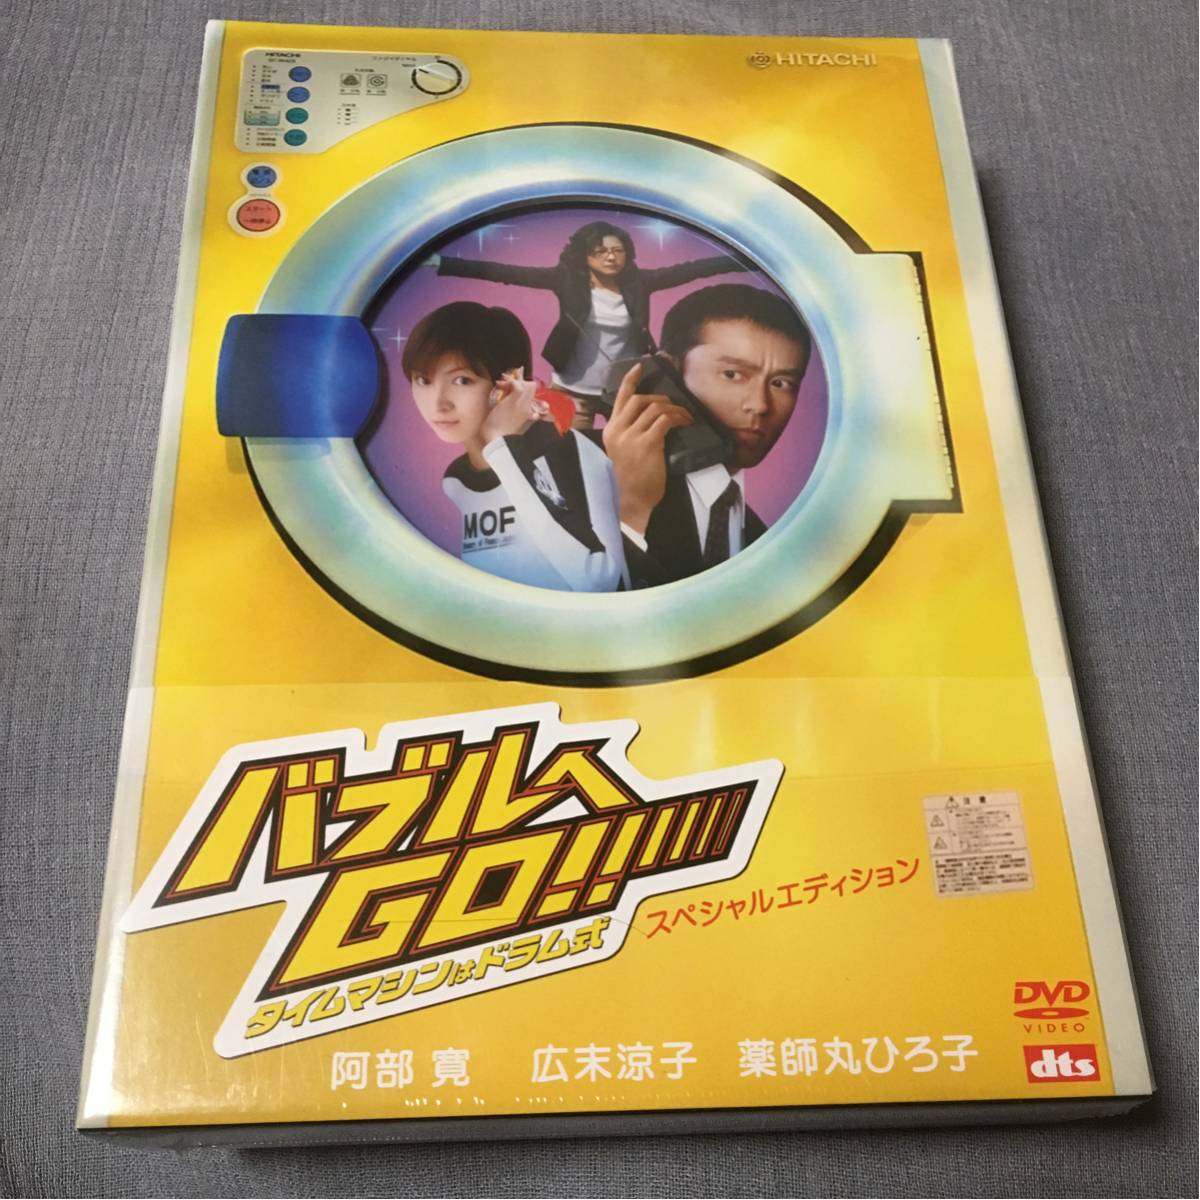 DVD バブルへGO!! タイムマシンはドラム式 スペシャル・エディション 2枚組 阿部寛 広末涼子 薬師丸ひろ子 コンサートグッズの画像